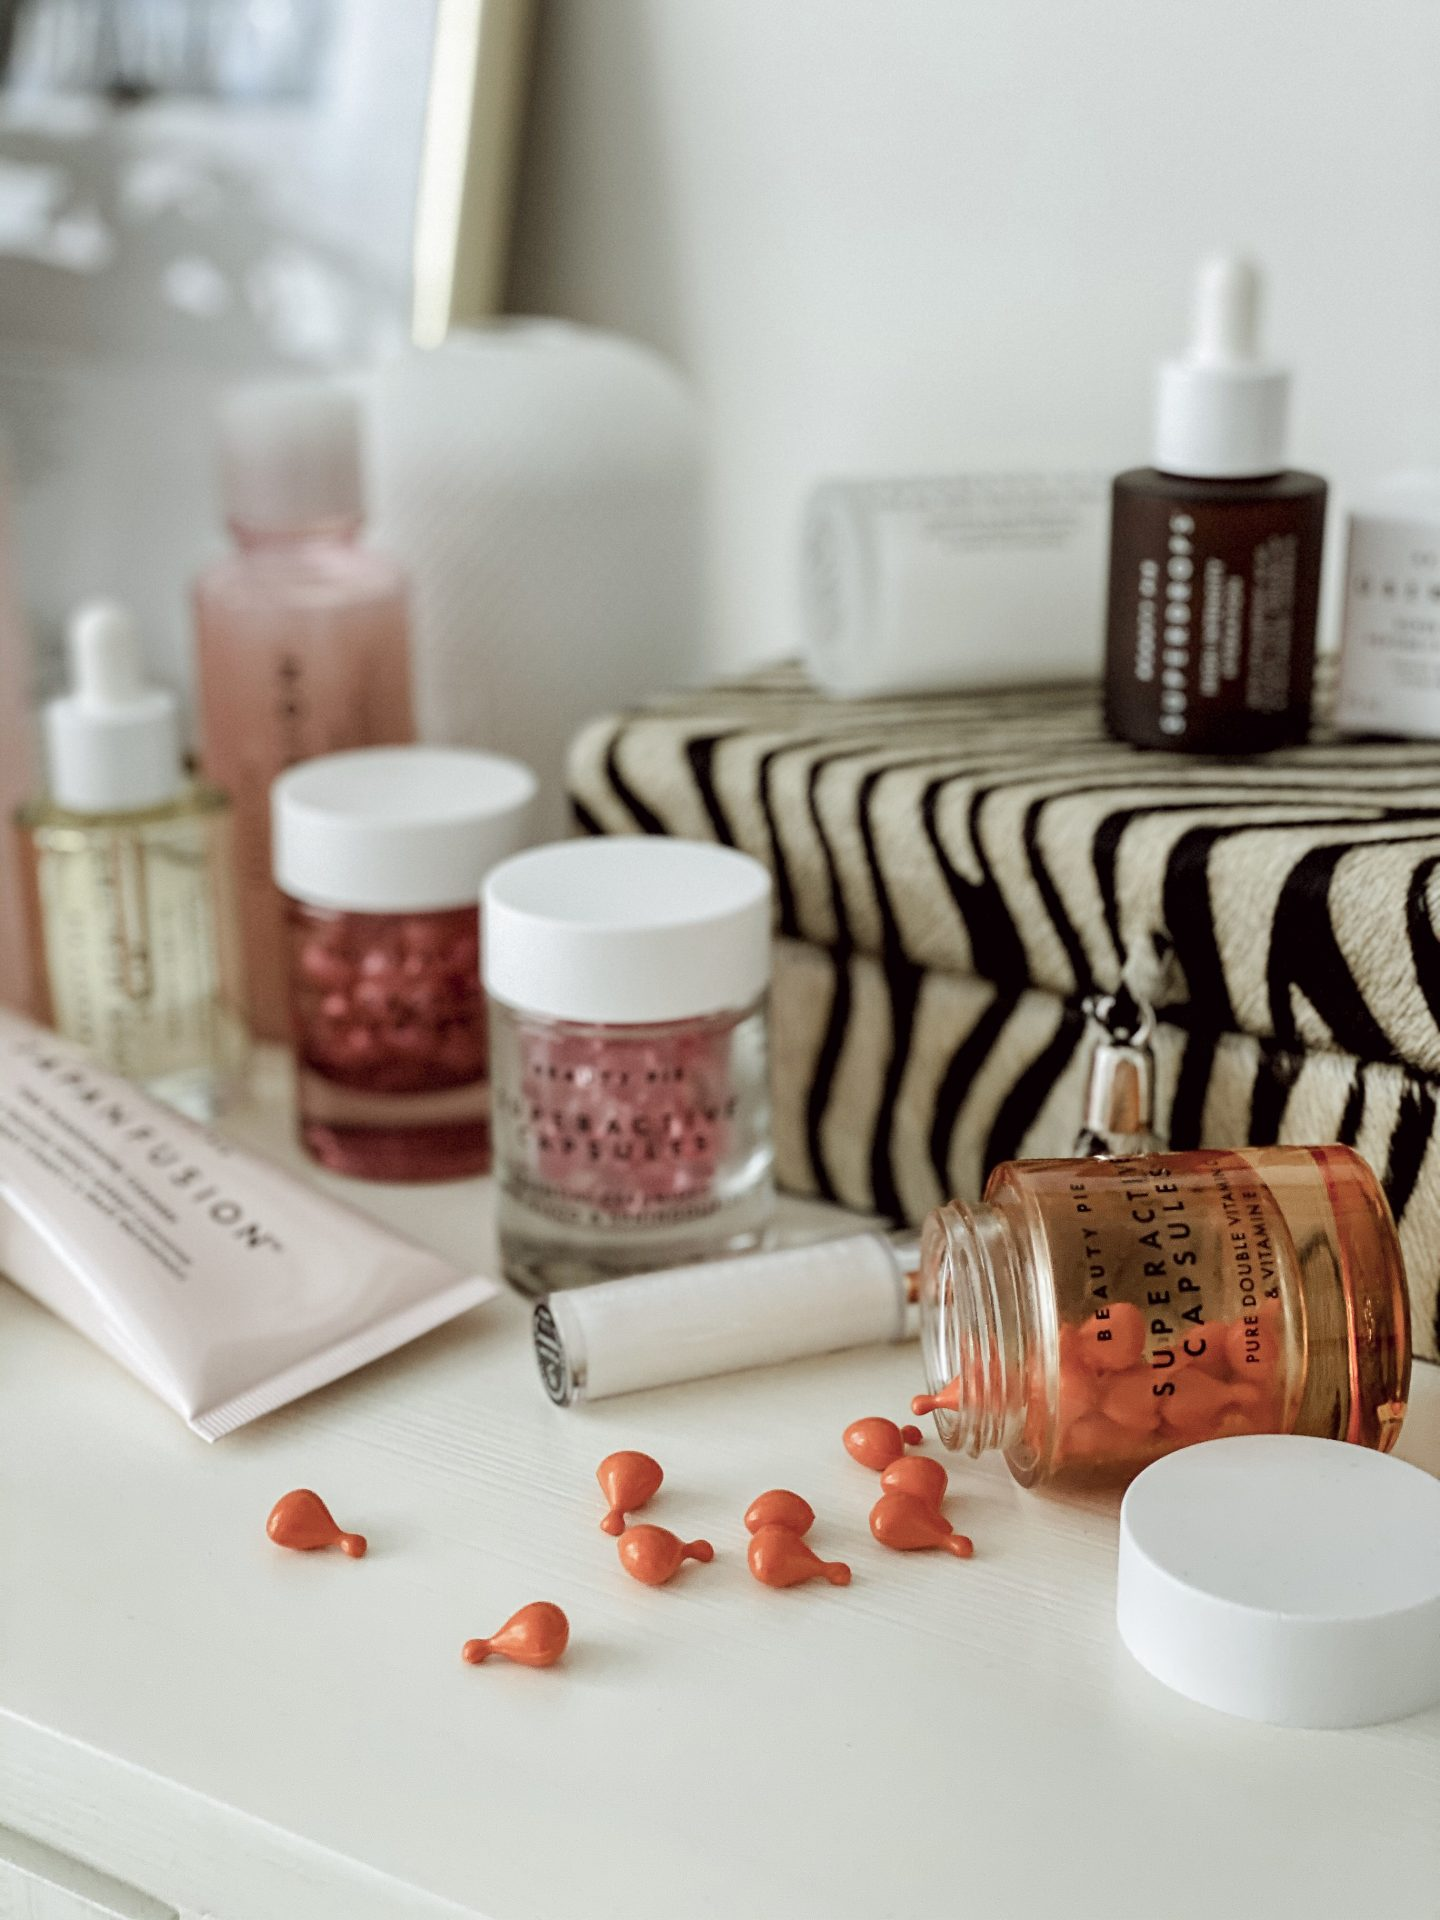 BeautyPie Review